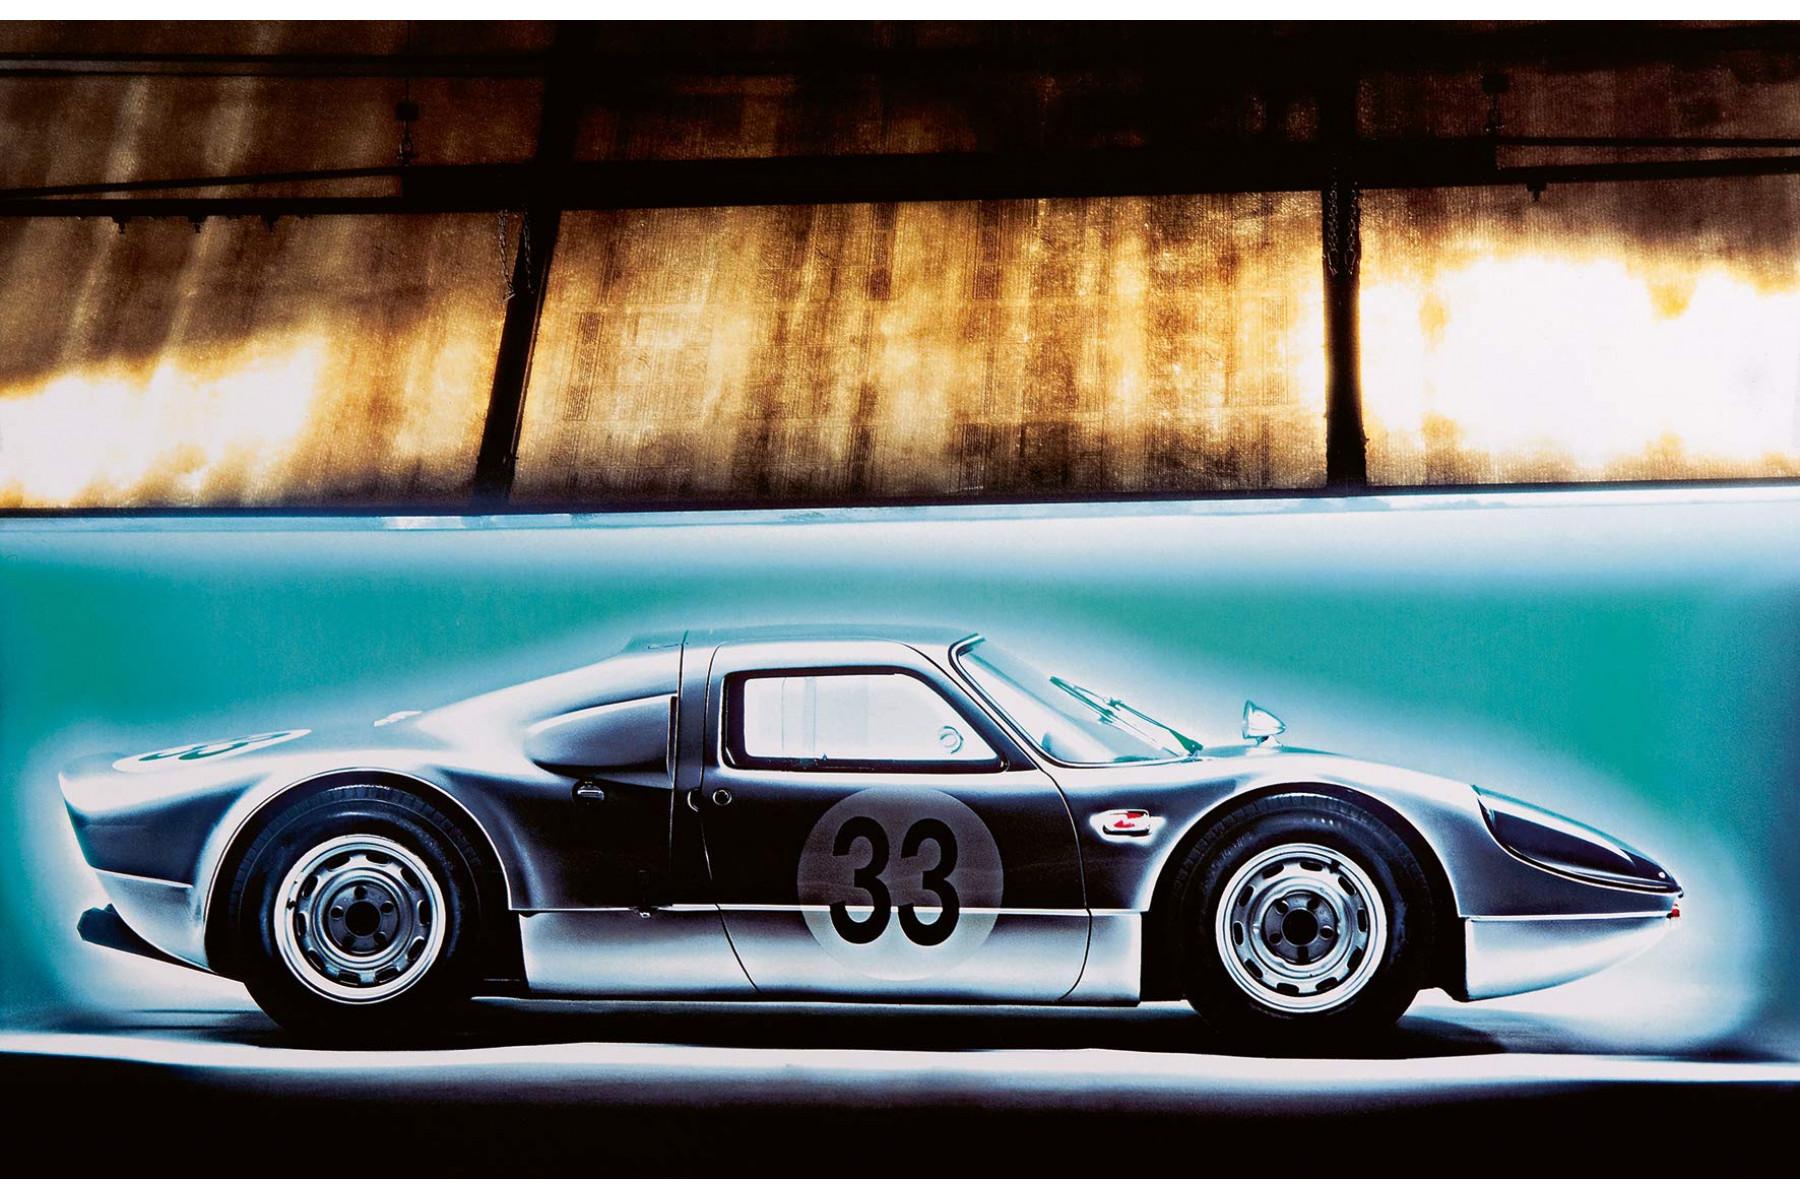 Porsche Book: The Best Porsche Images by Frank M. Orel